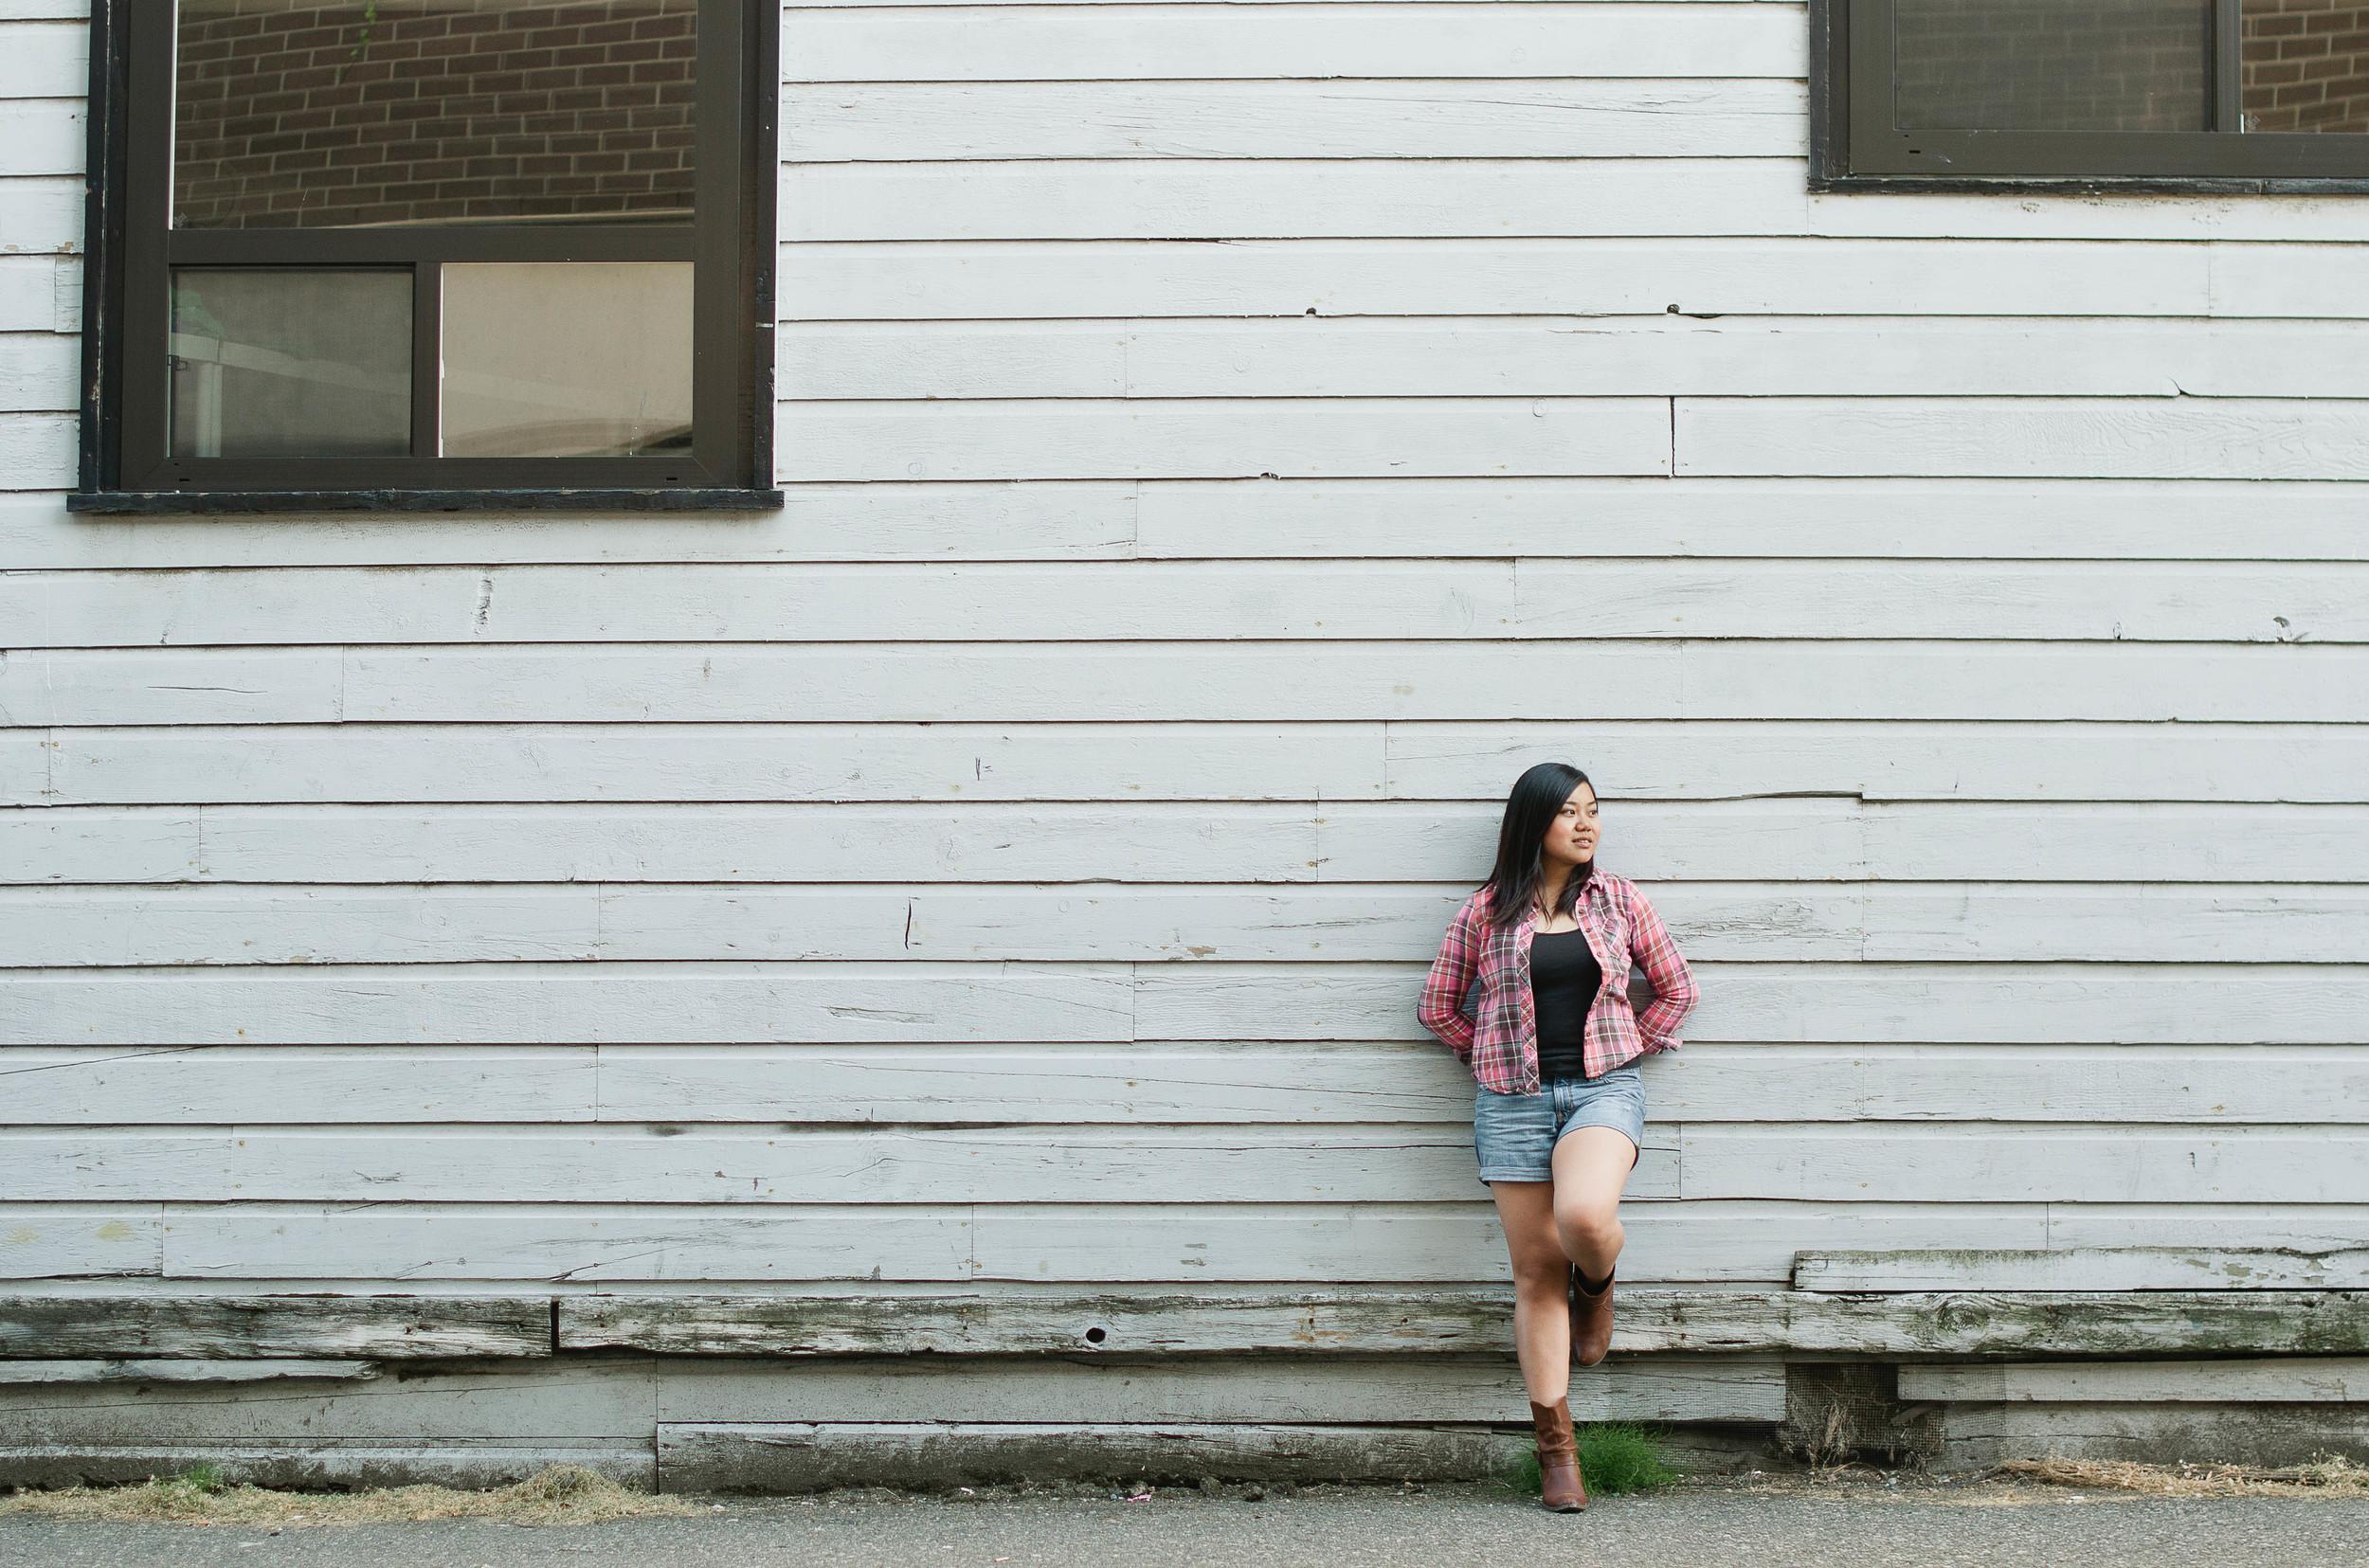 Melissa-Katie Powell Photography - Olympic Village-Portraits-Vancouver-12.jpg